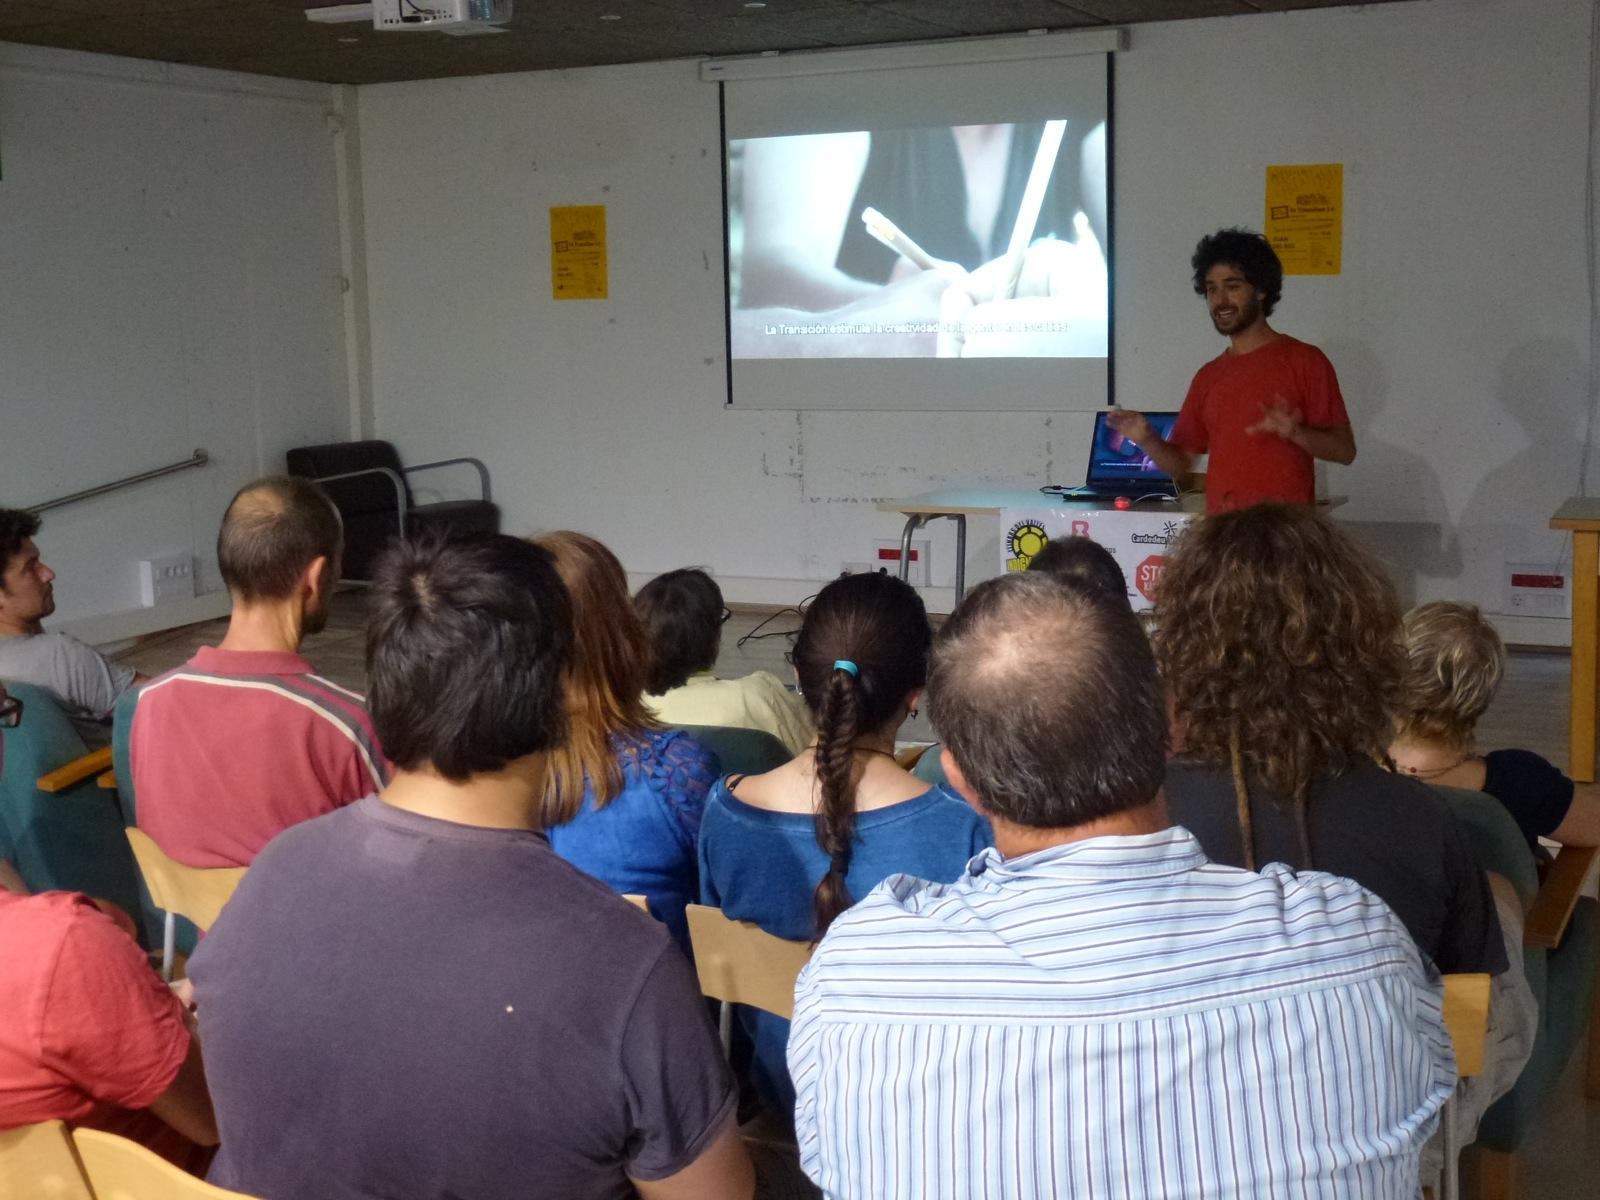 In Transition 2.0 Cardedeu - Juan del Río